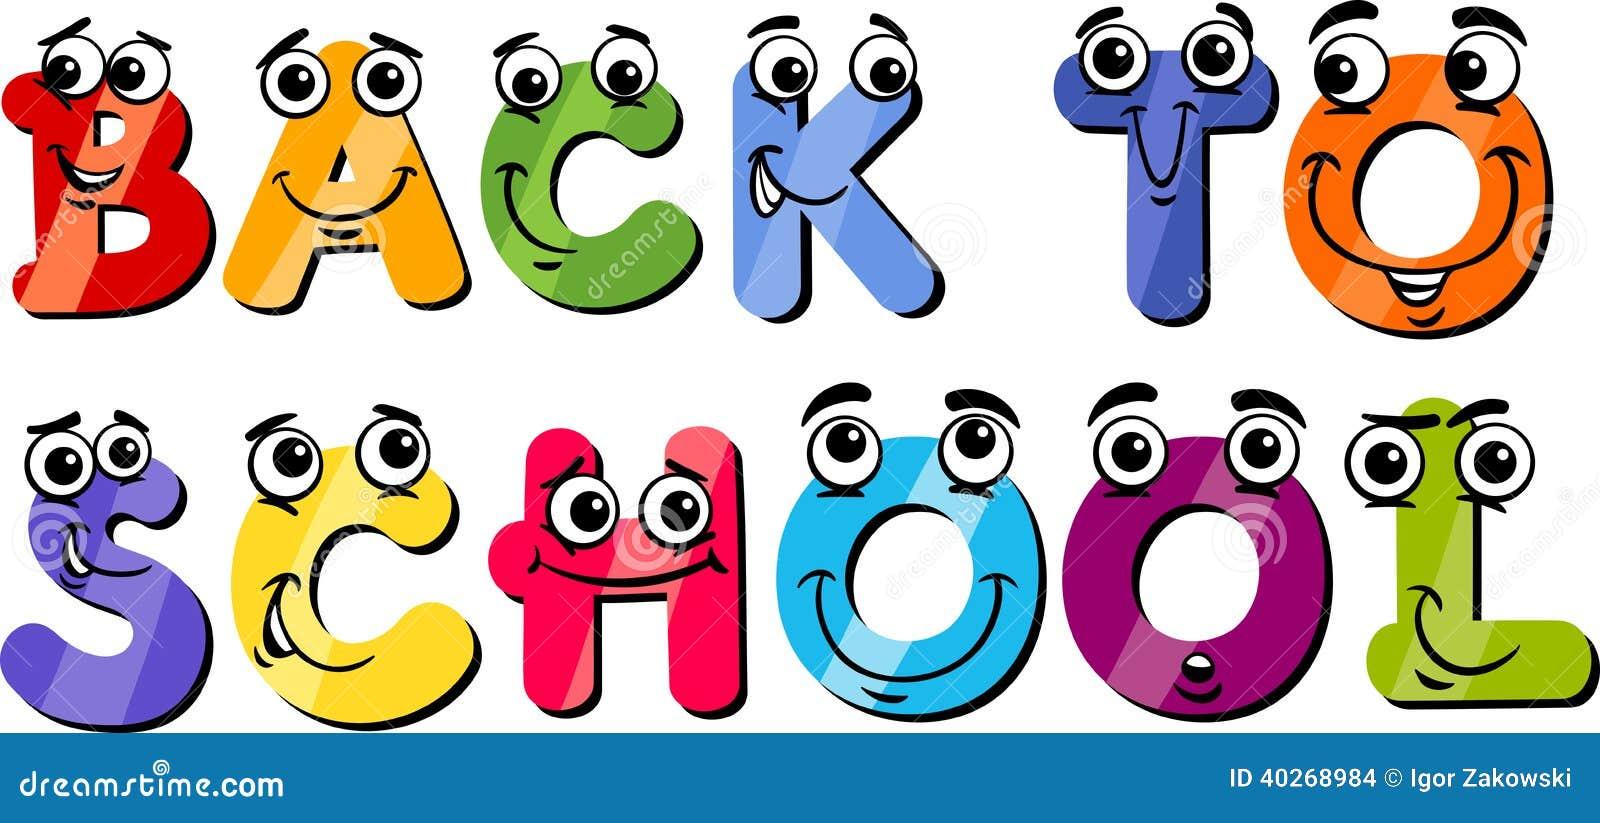 Back To School Sign Cartoon Stock Vector - Image: 40268984